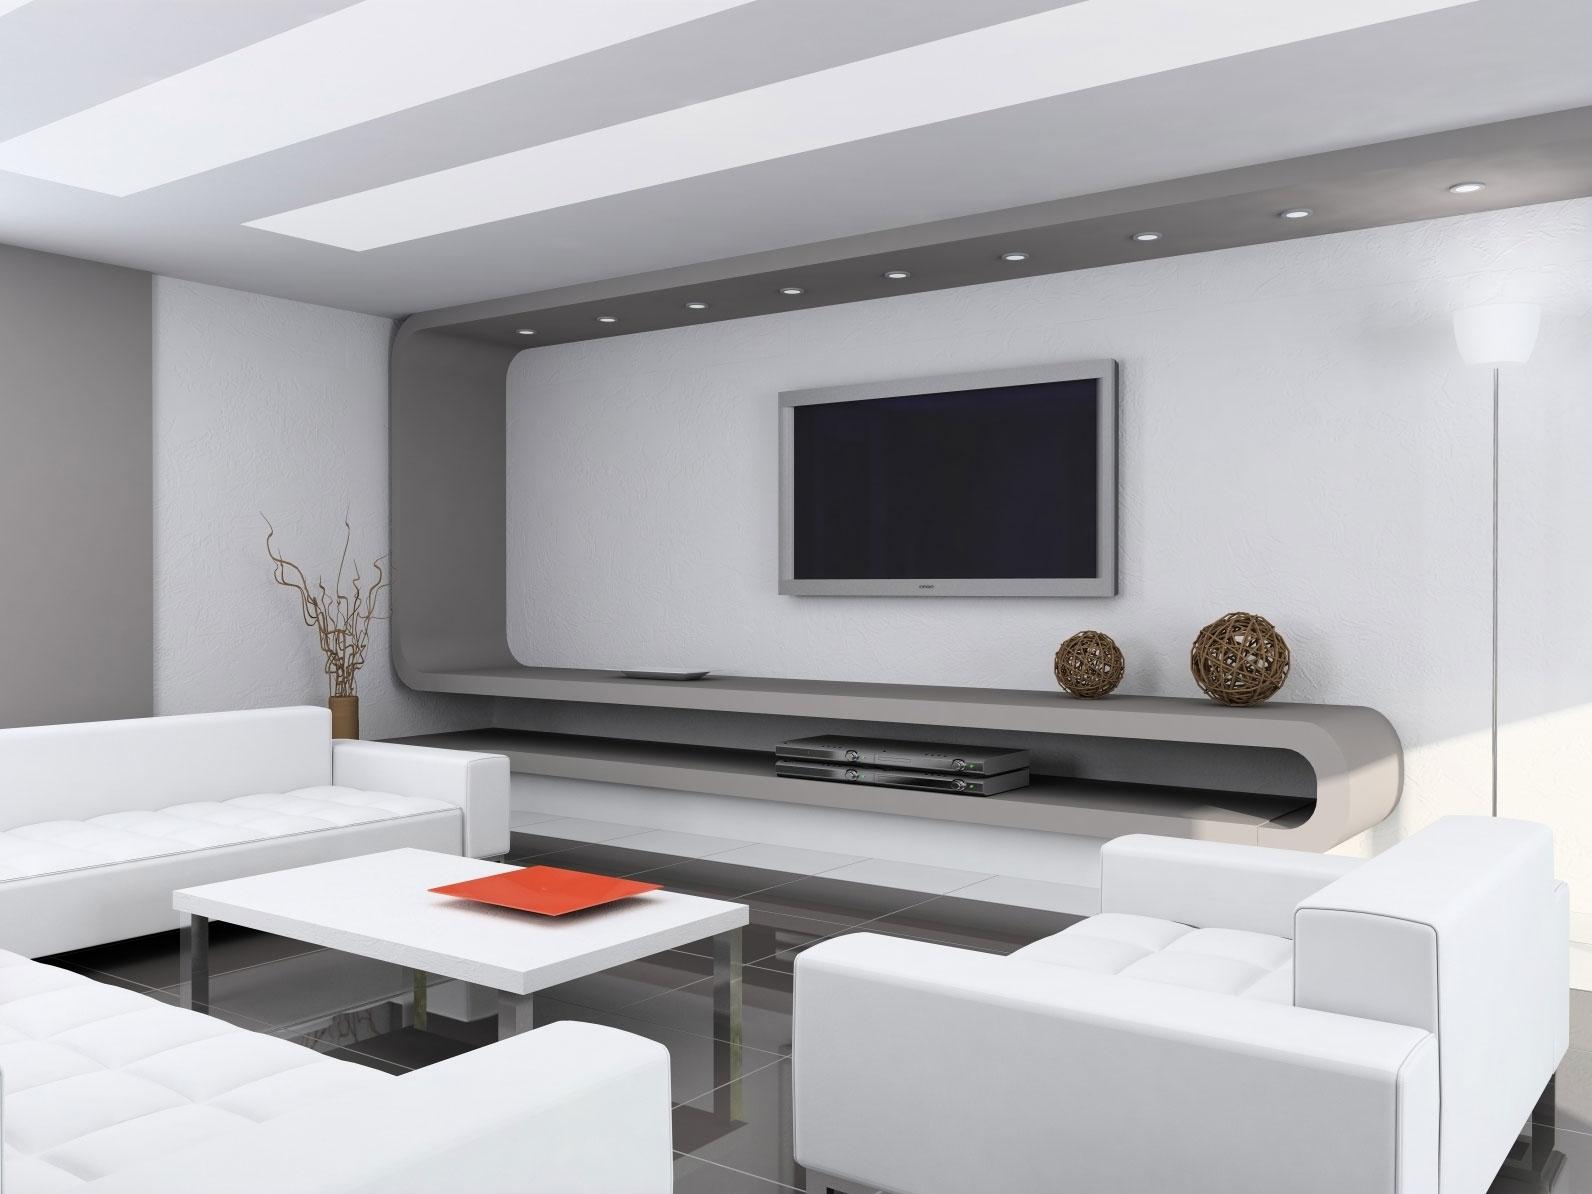 http://3.bp.blogspot.com/_ZqmBmco-uQE/TOEOTO3HkVI/AAAAAAAAAPM/vJAOJQ3w9-s/s1600/interior_design_ideas_screensaver-53993.jpg